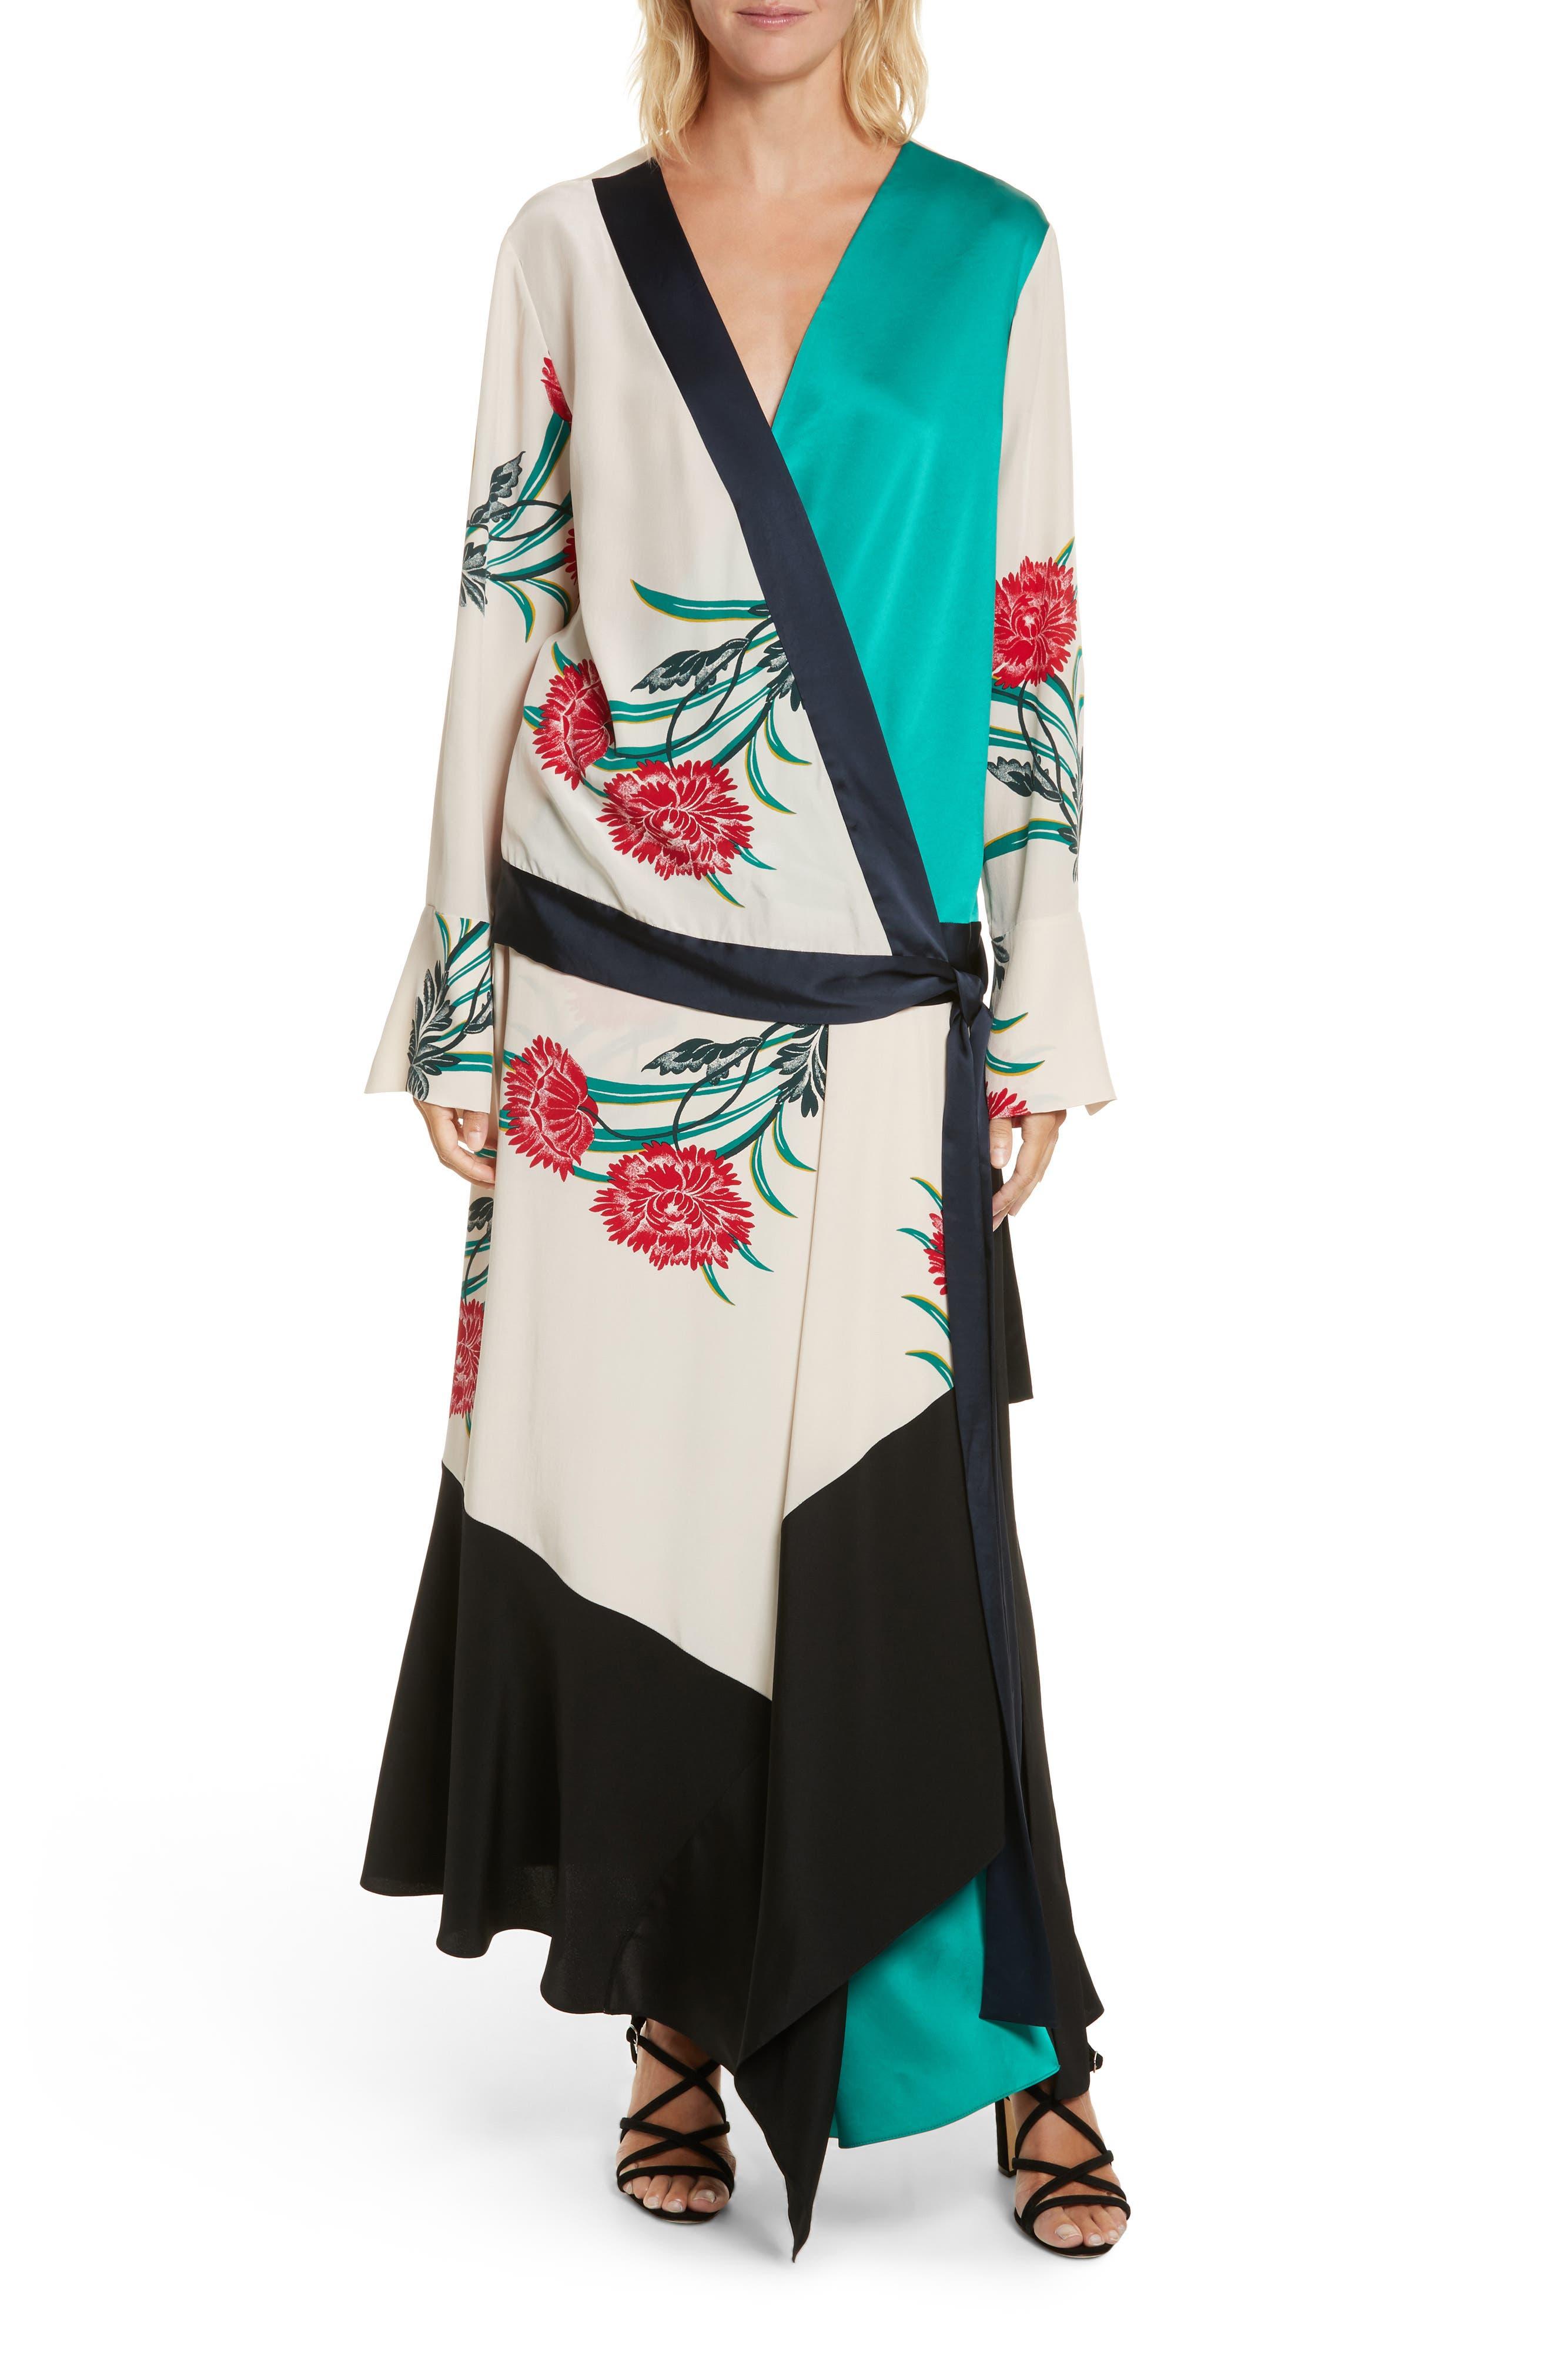 Diane von Furstenberg Bell Sleeve Crossover Silk Blouse,                             Alternate thumbnail 6, color,                             Farren Pearl/ Alex Navy/ Jade